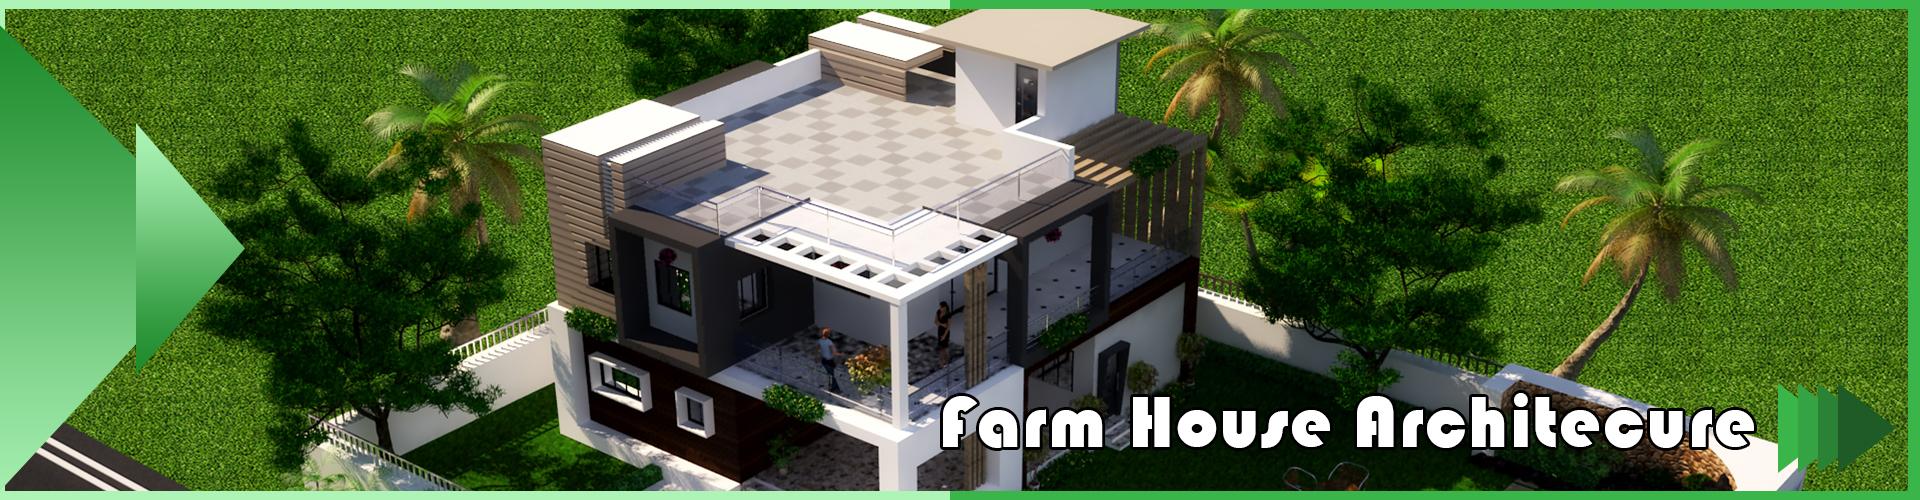 Farm House Design Plan Design Your Farm House Plan Here